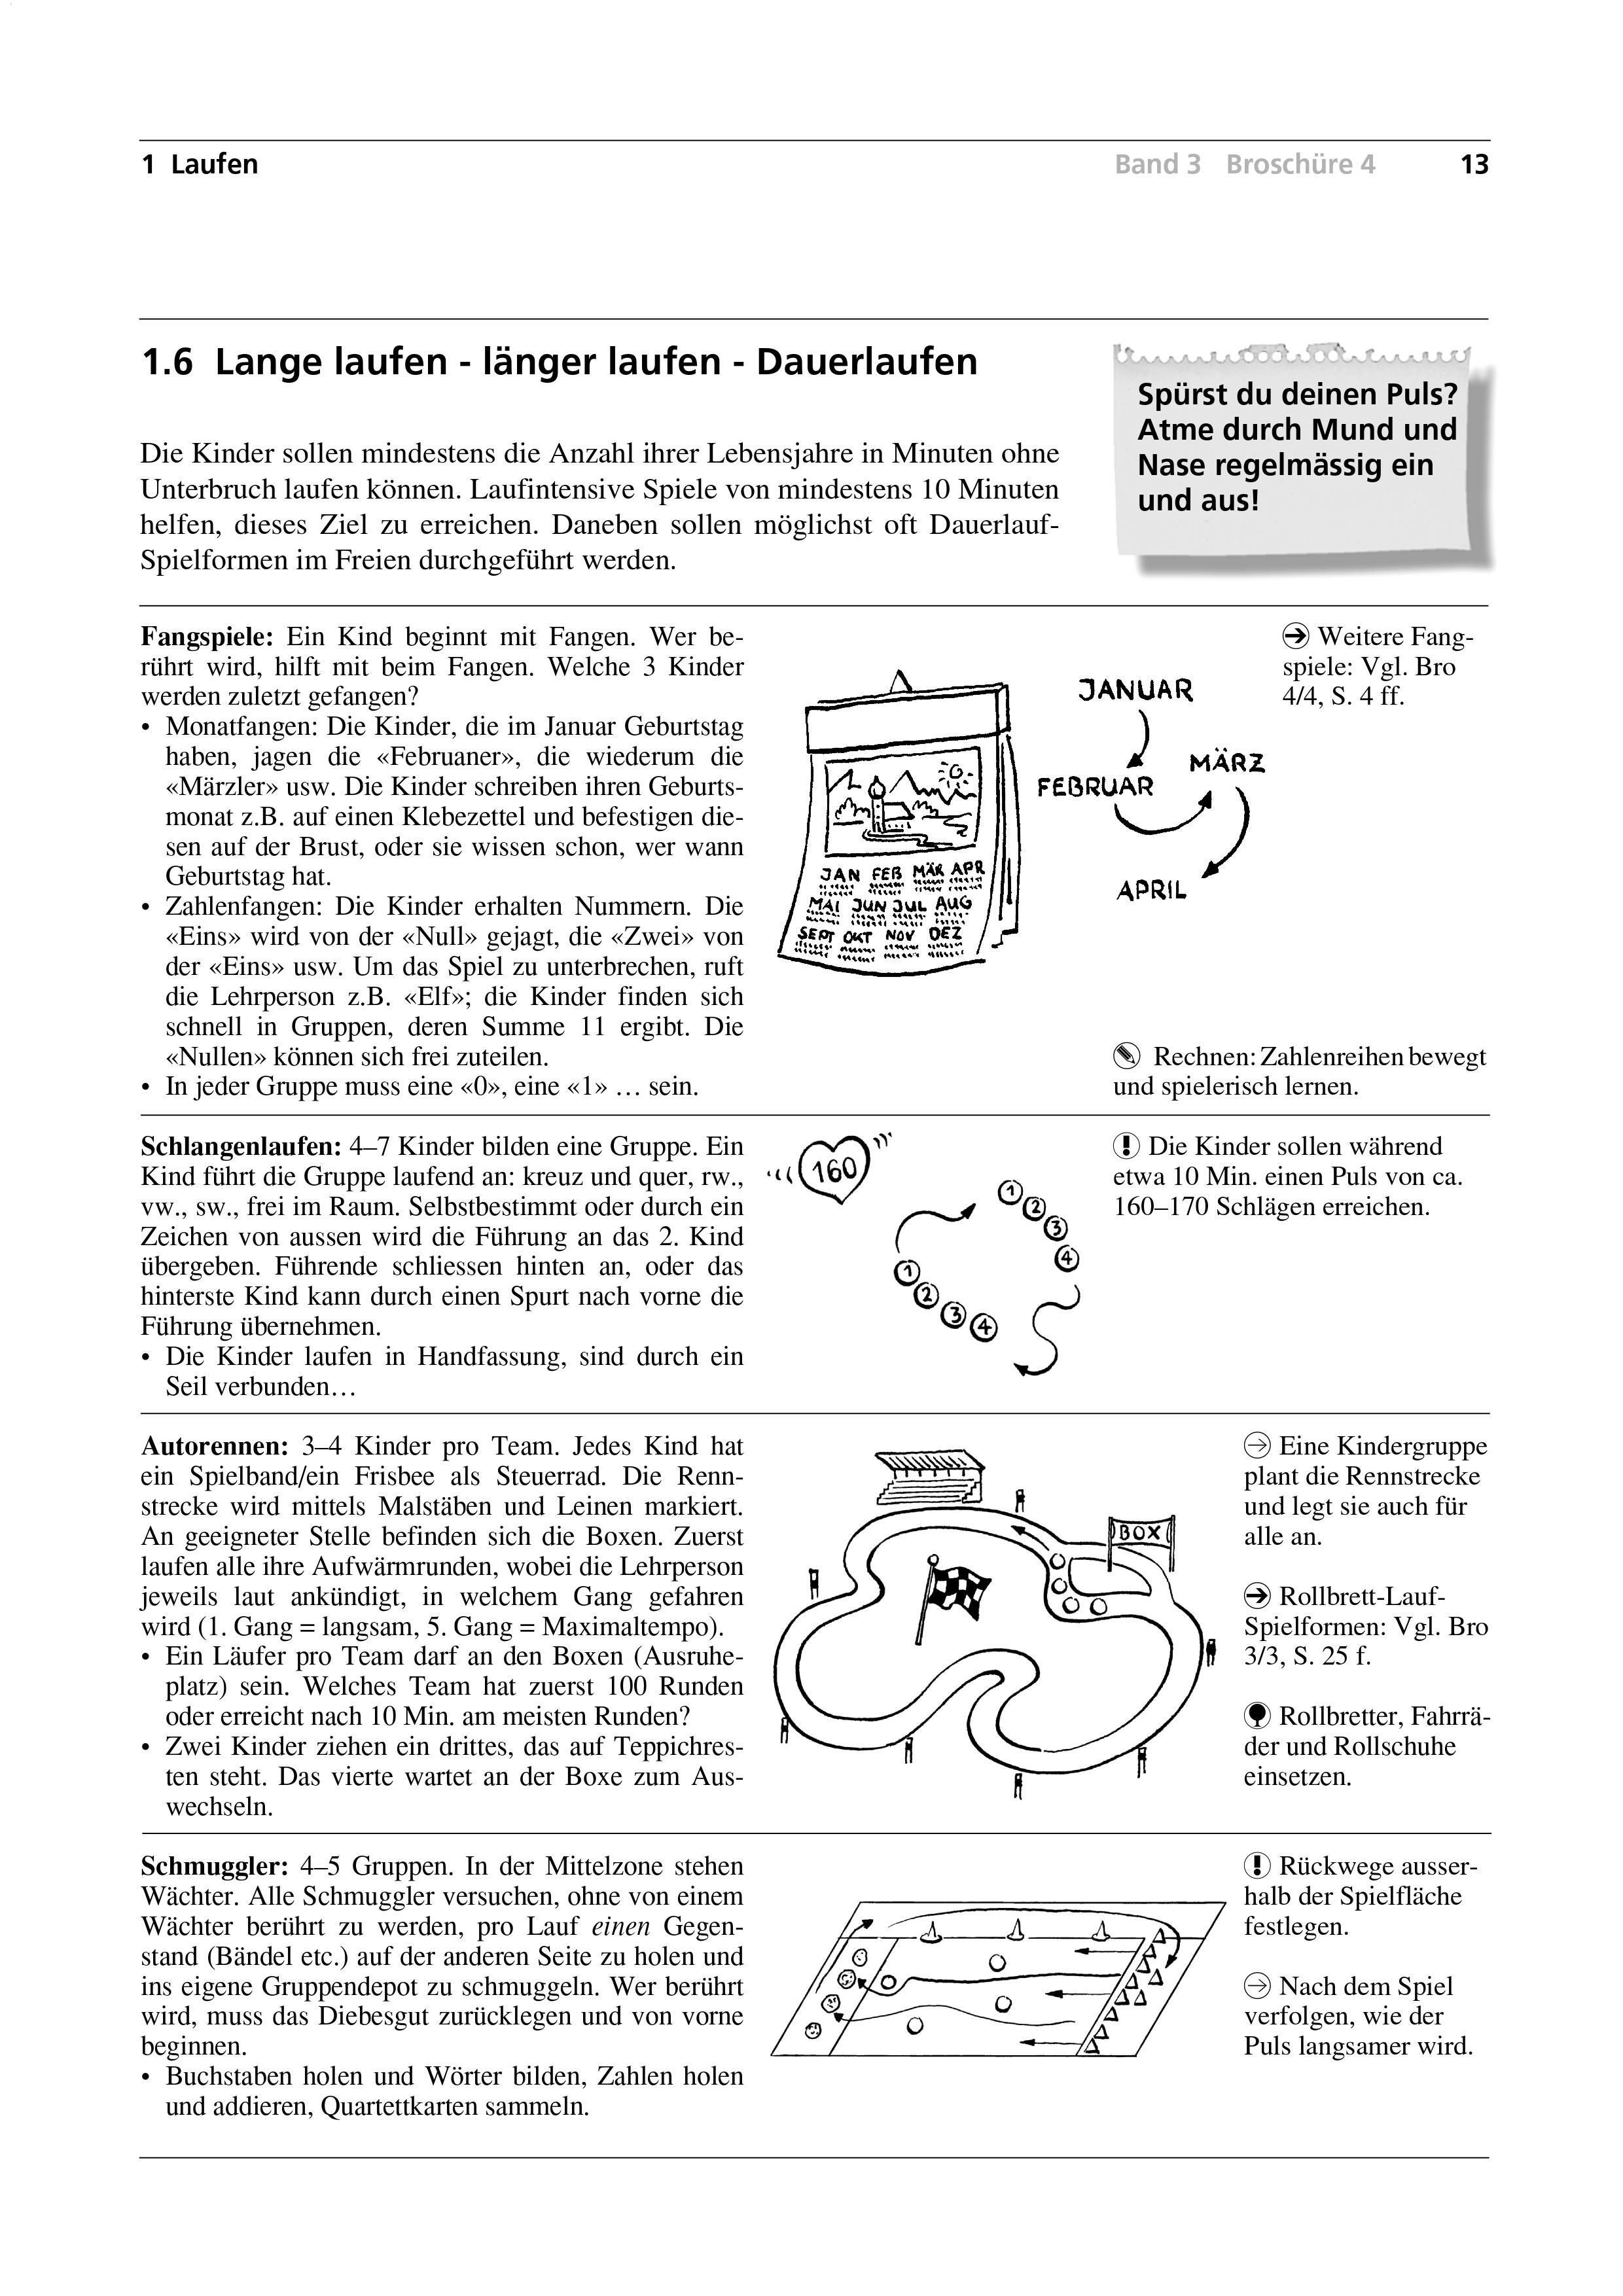 Preview image for LOM object Lange laufen - länger laufen - Dauerlaufen